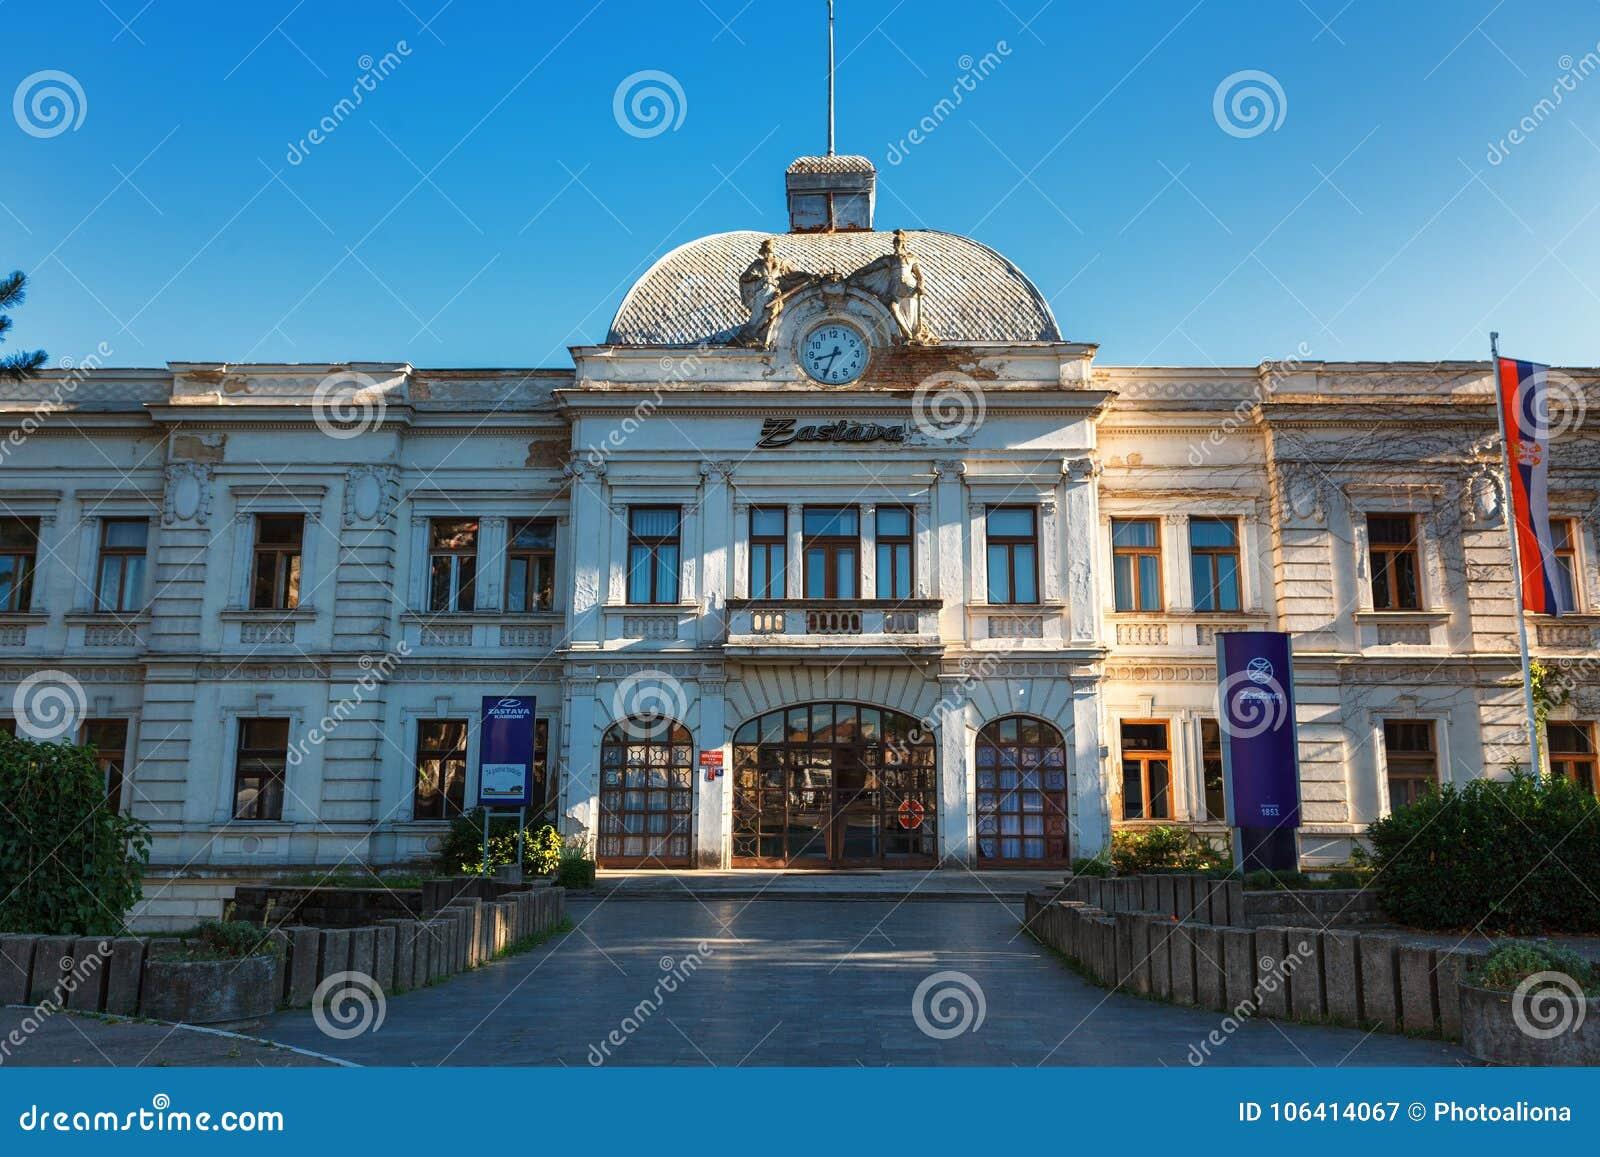 Kragujevac, Σερβία - 18 Ιουλίου 2016: Περιοχή Livnica Stara, παλαιό εγκαταλειμμένο Zastava εργοστάσιο Zastava σε Kragujevac, Σερβ